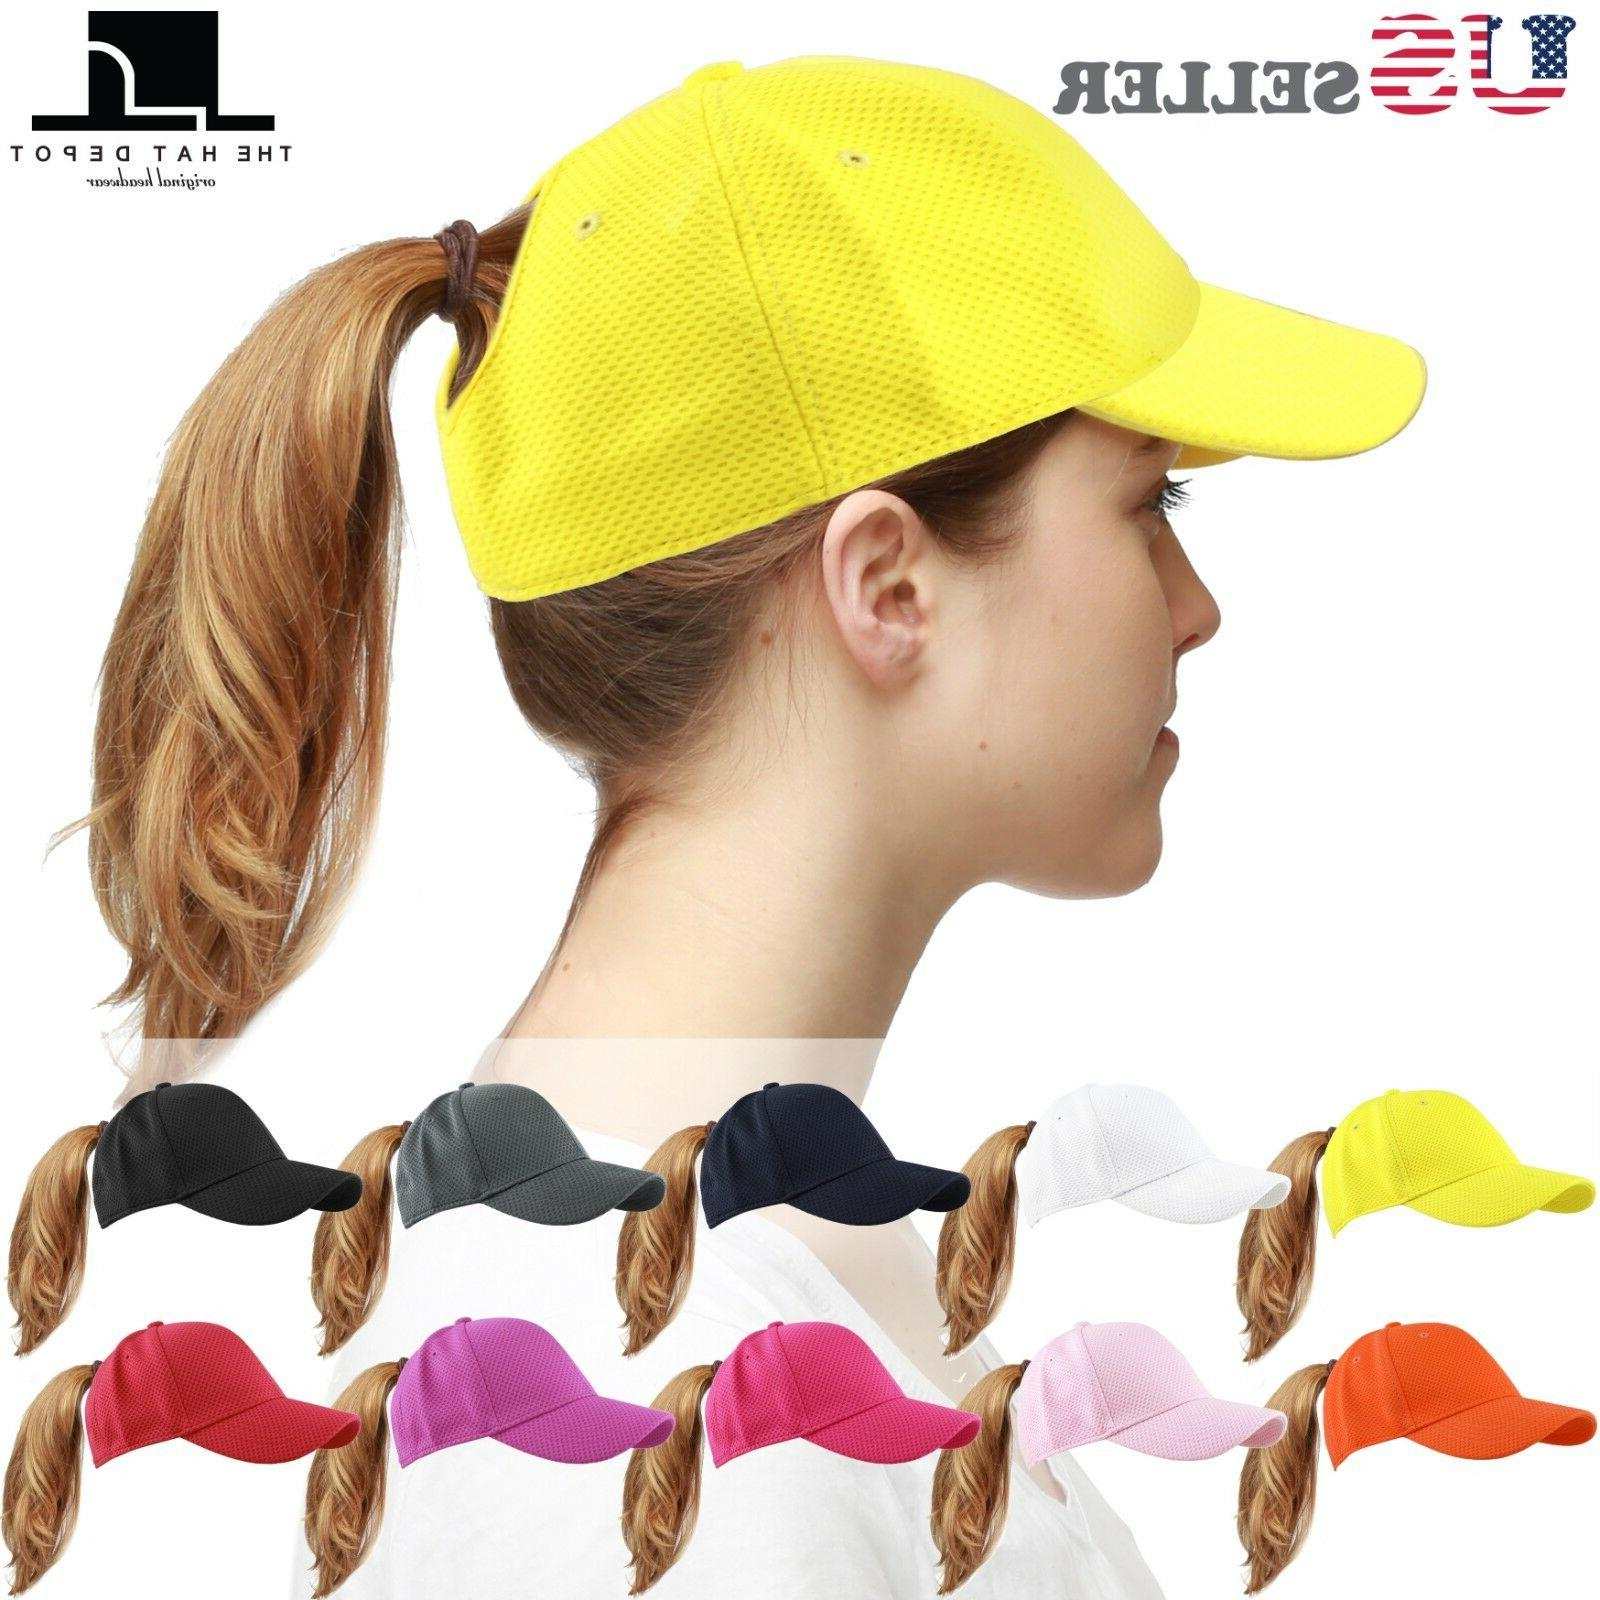 baseball cap ponytail high bun stretch fit